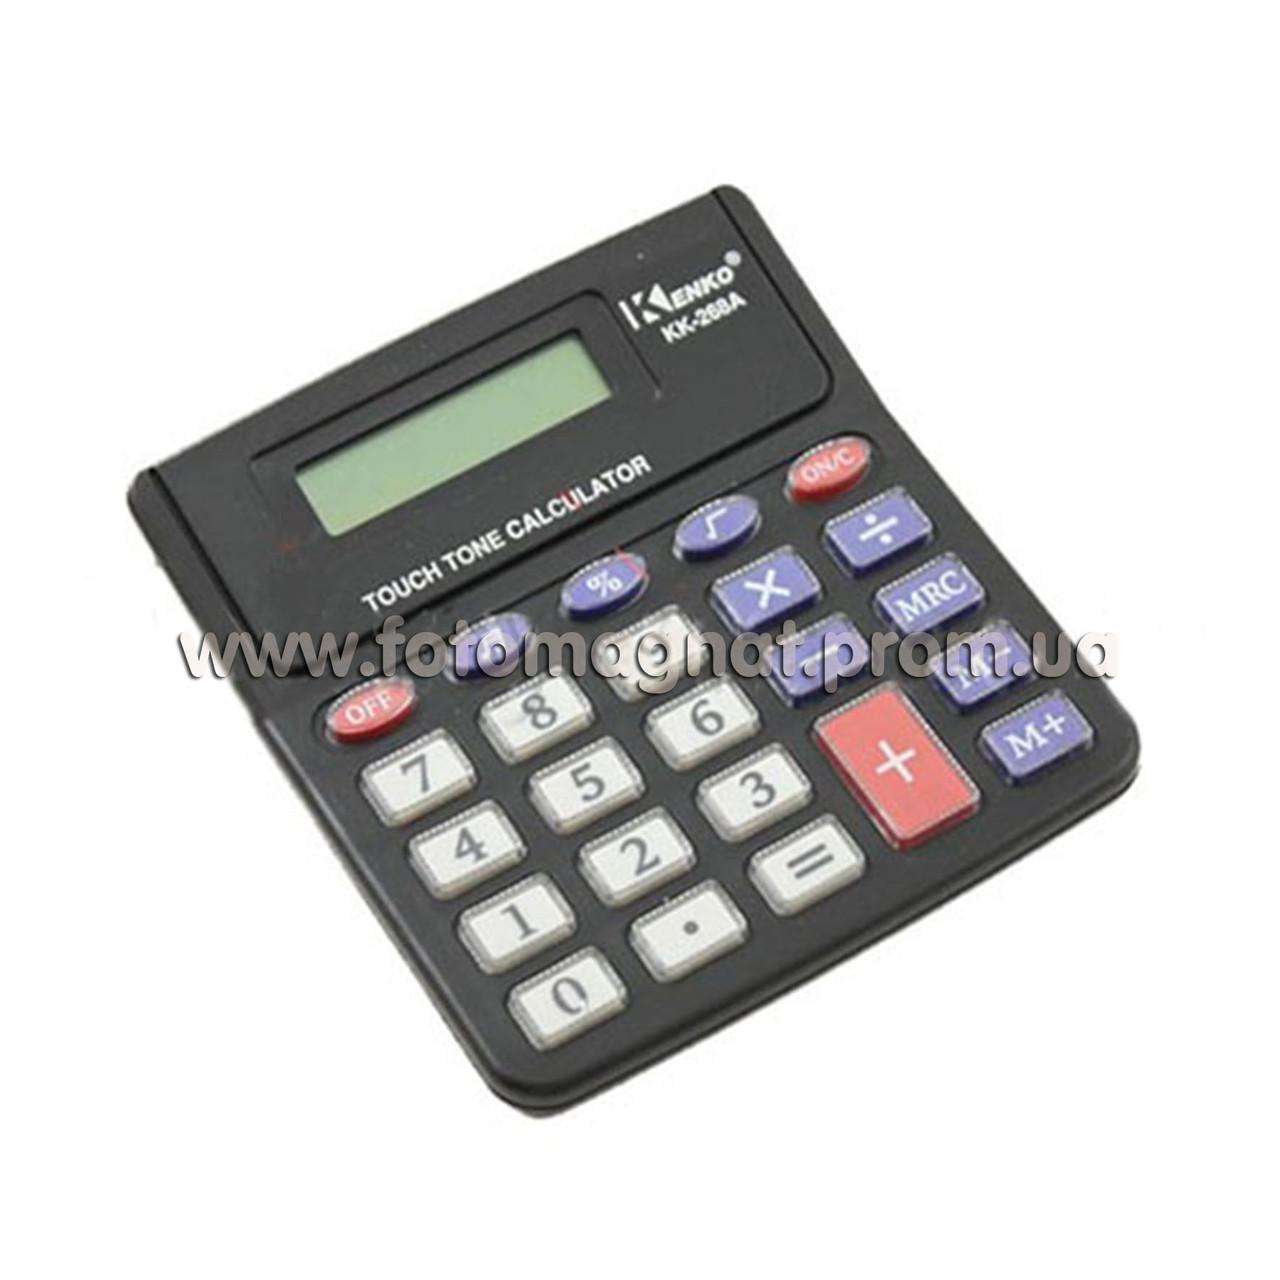 Калькулятор Kenko К 268/729A/8819А - 8